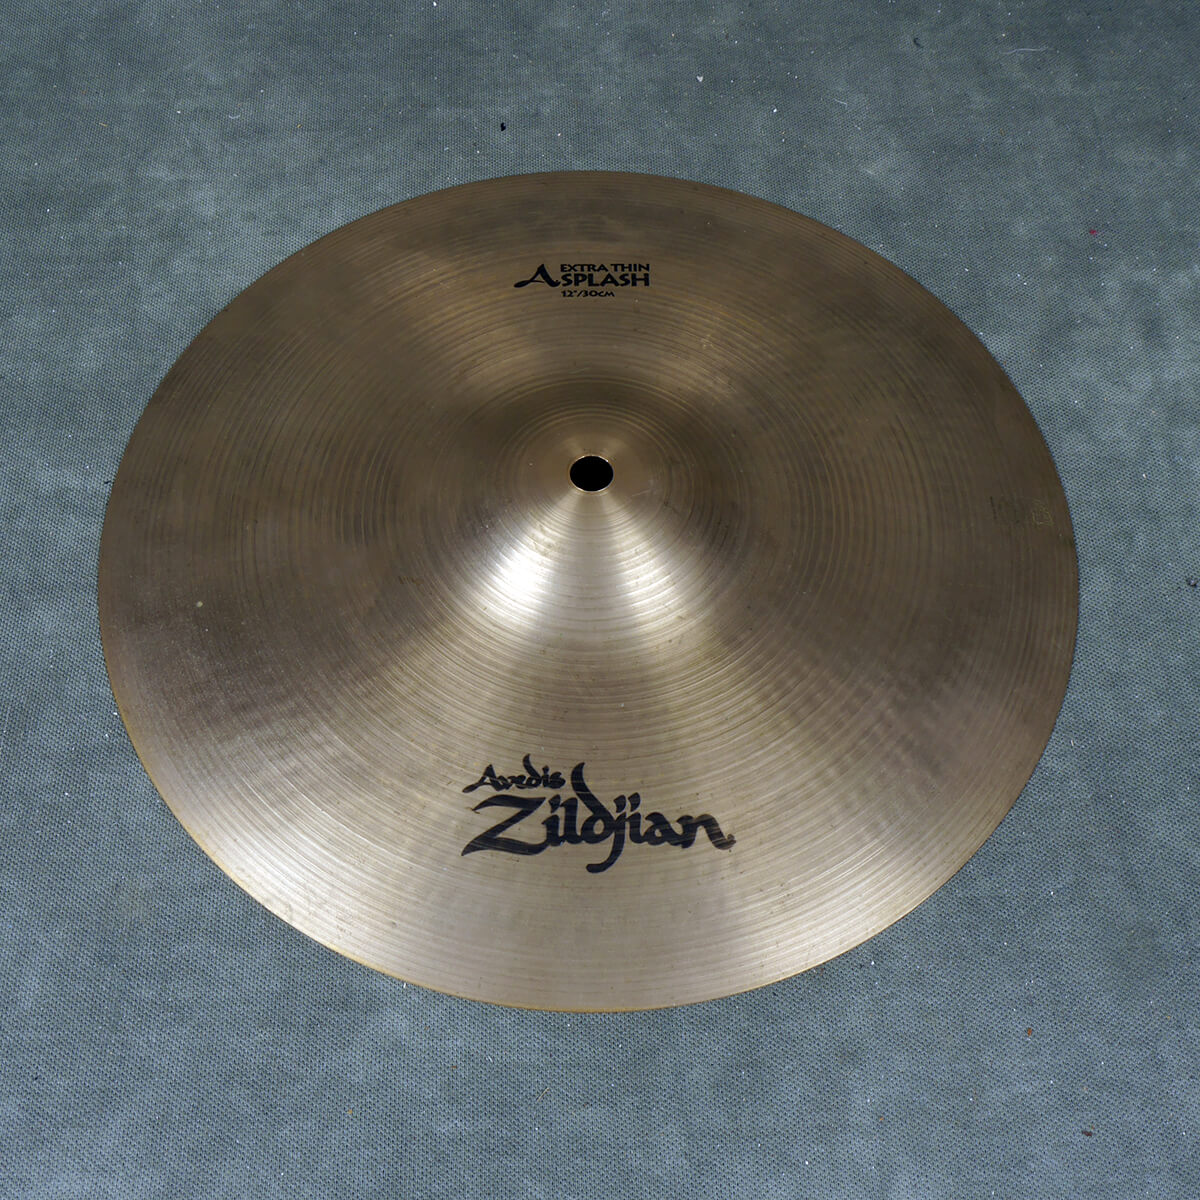 Zildjian Avedis 12″ Extra Thin Splash Cymbal - 2nd Hand